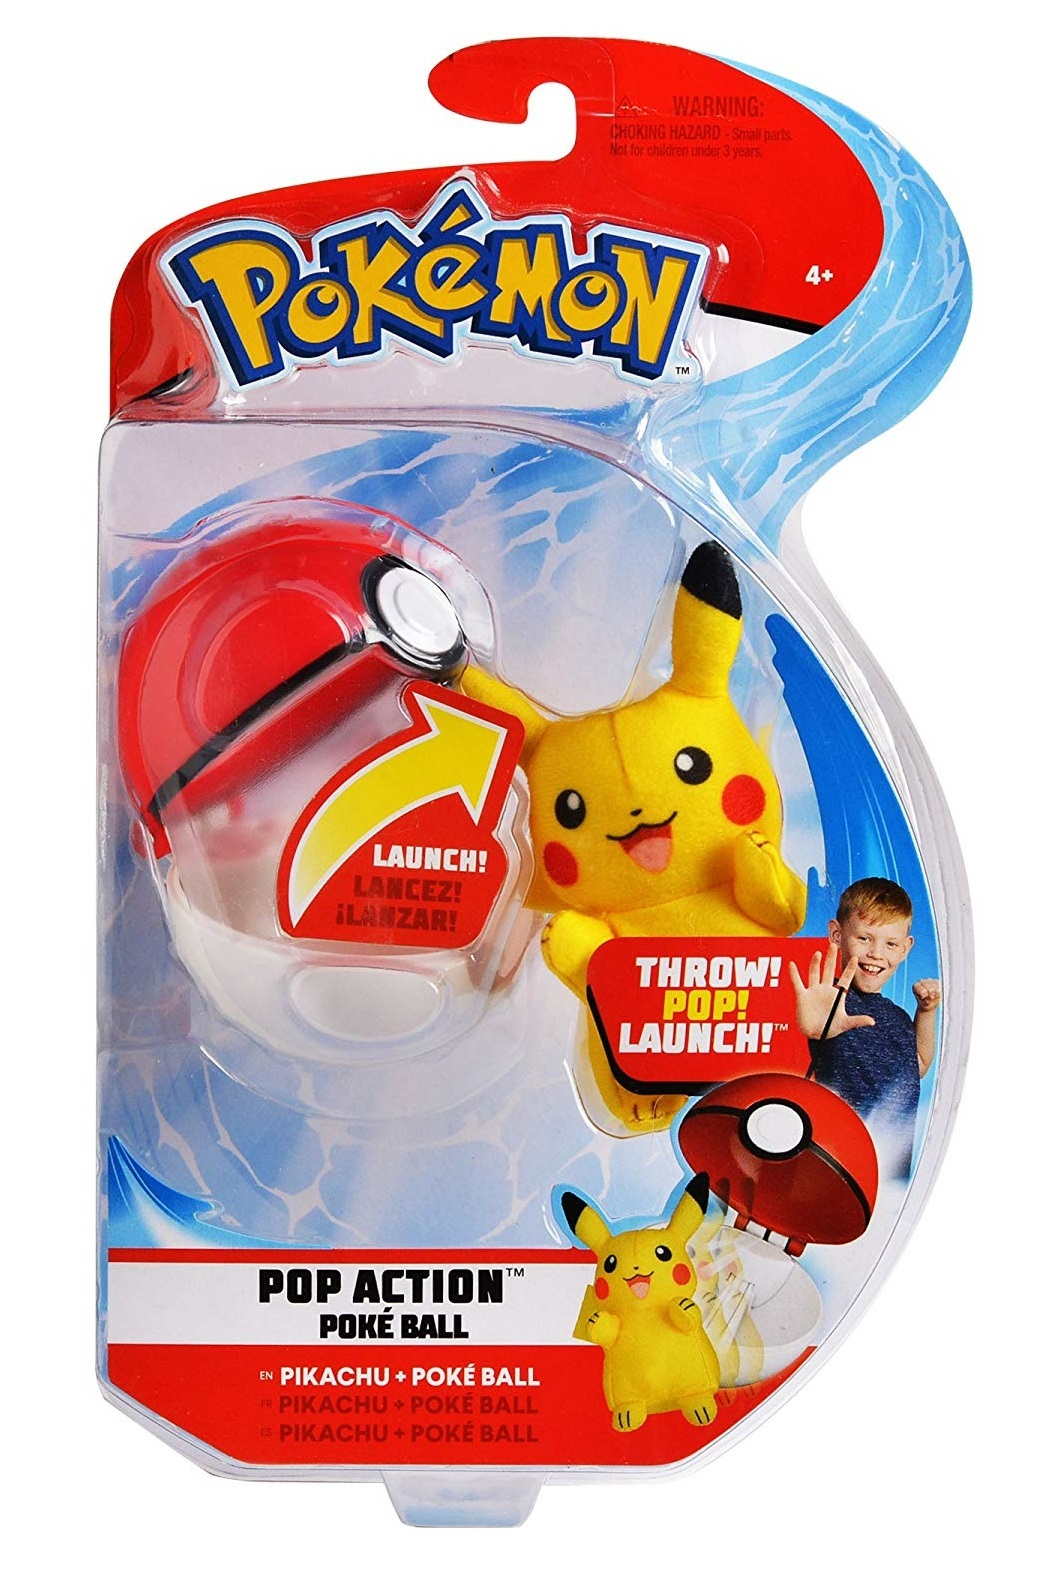 Pokemon: Pop Action Poke Ball - Pikachu image